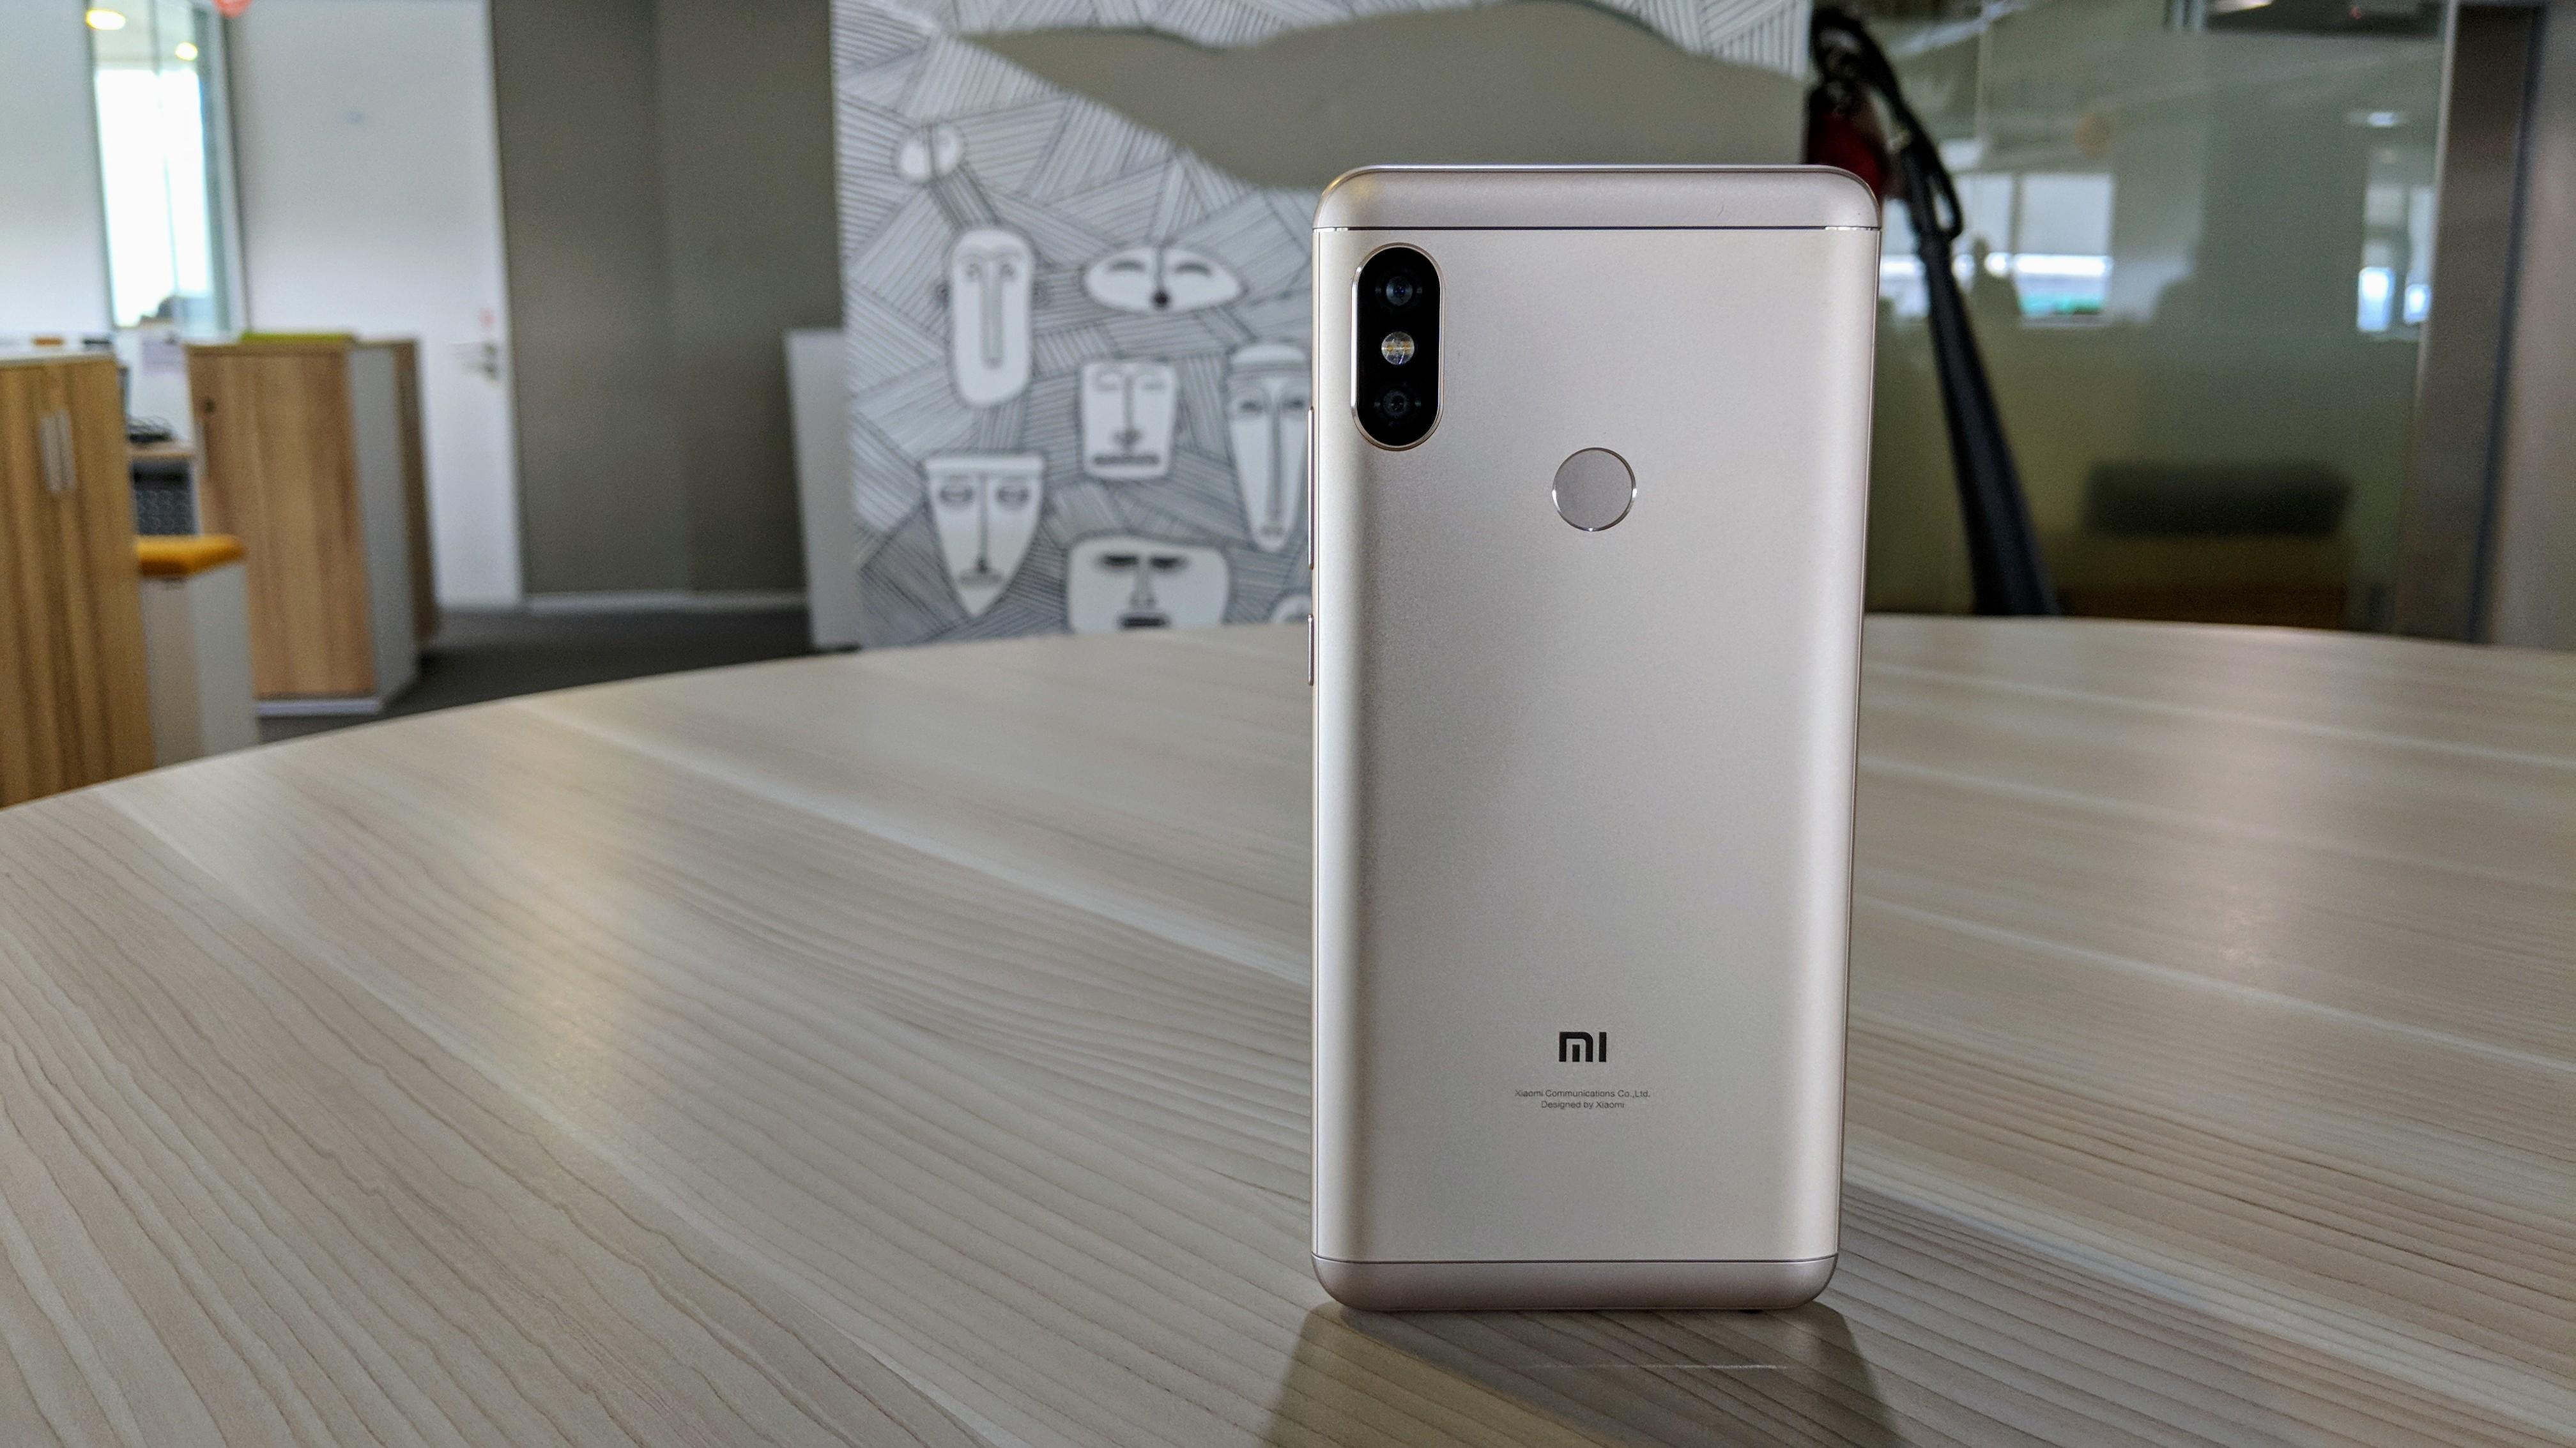 Xiaomi Redmi Note 5 Pro Techradar 3g White